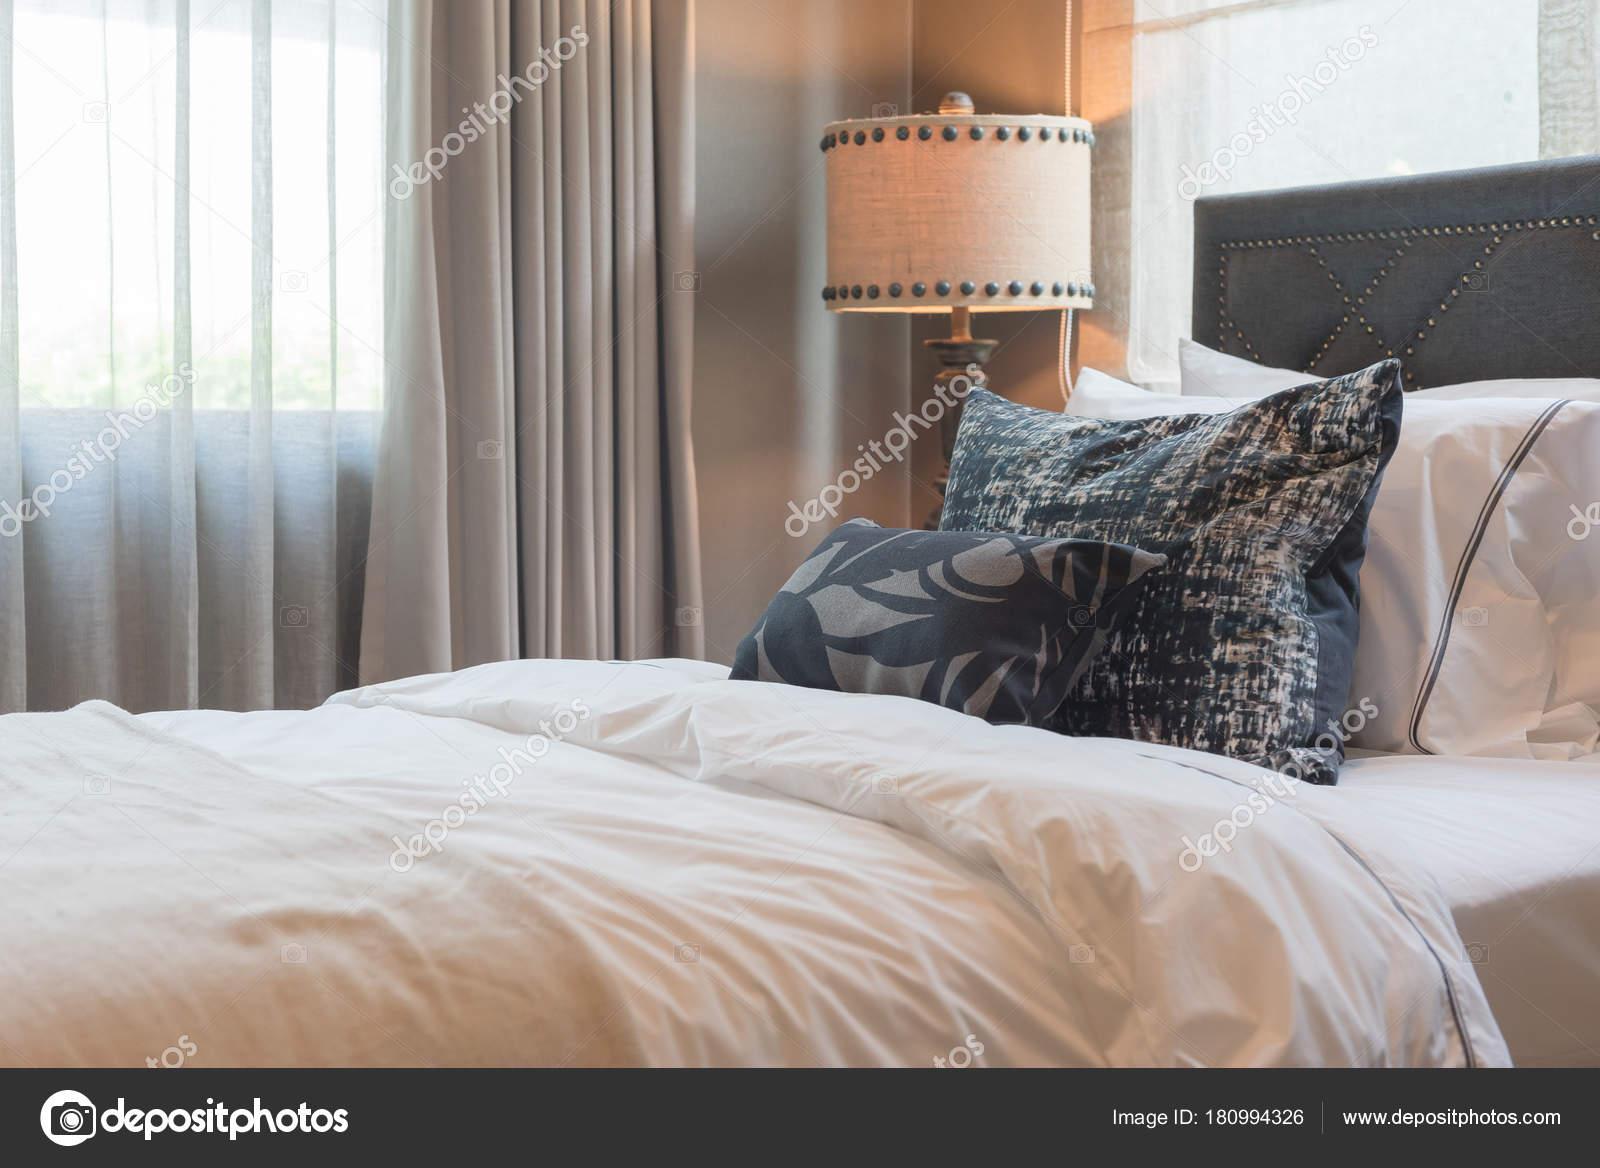 Single Bedroom Set Pillows Bed Interior Decoration Design Concept Stock Photo C Khongkitwiriyachan 180994326